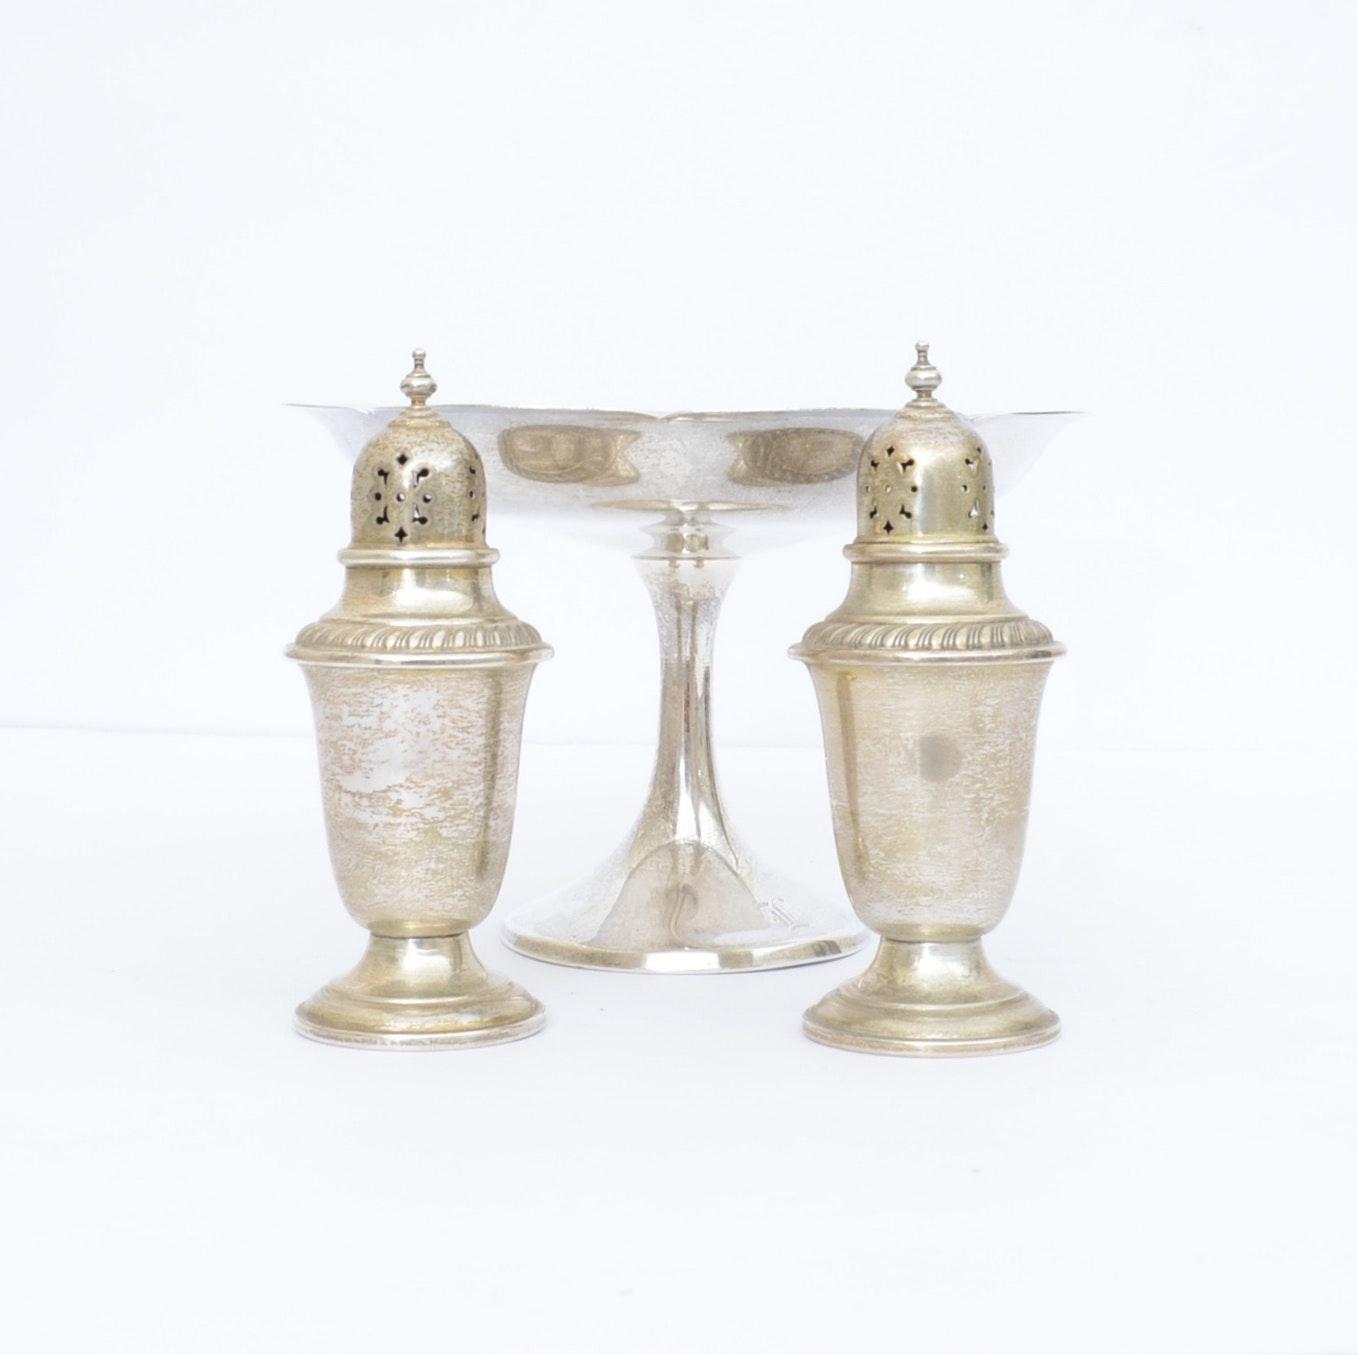 Gorham Sterling Silver Salt and Pepper Shaker and a Manchester Pedestal Bowl